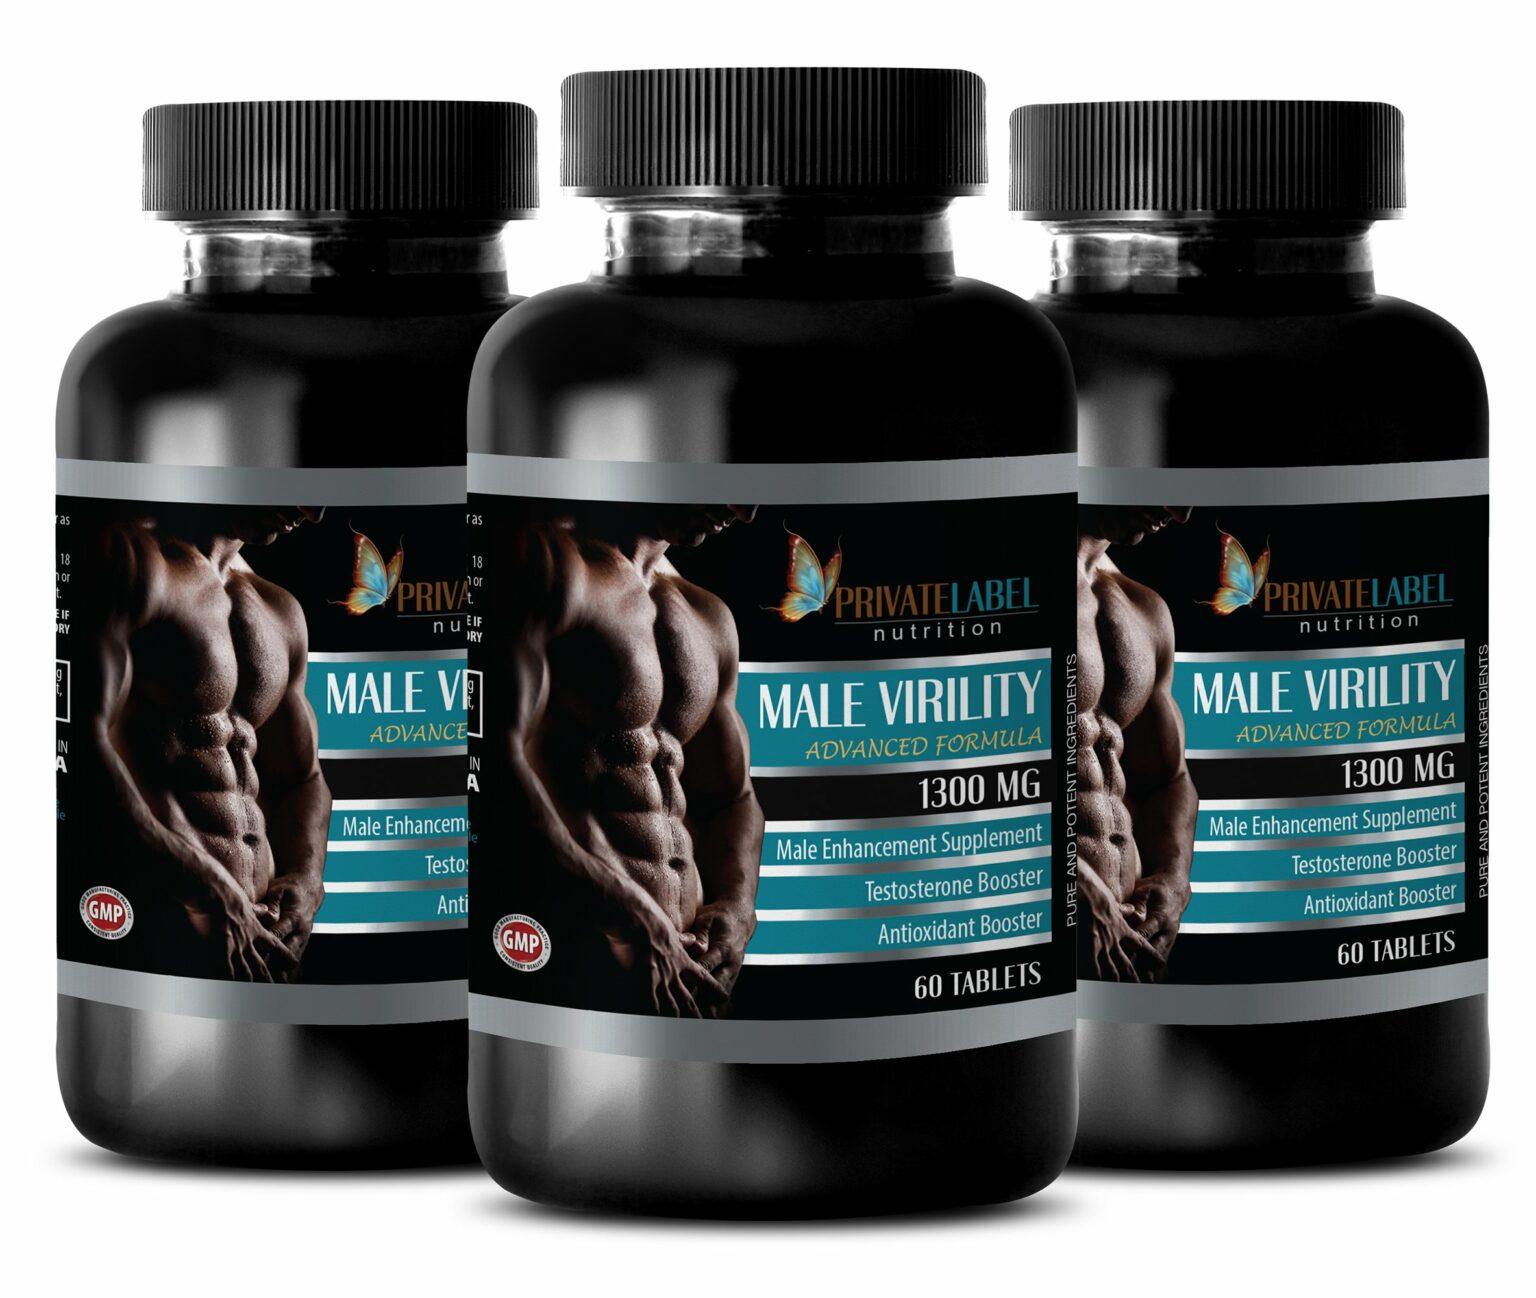 Increase Sex Drive for Men Natural - Male Virility 1300 Mg